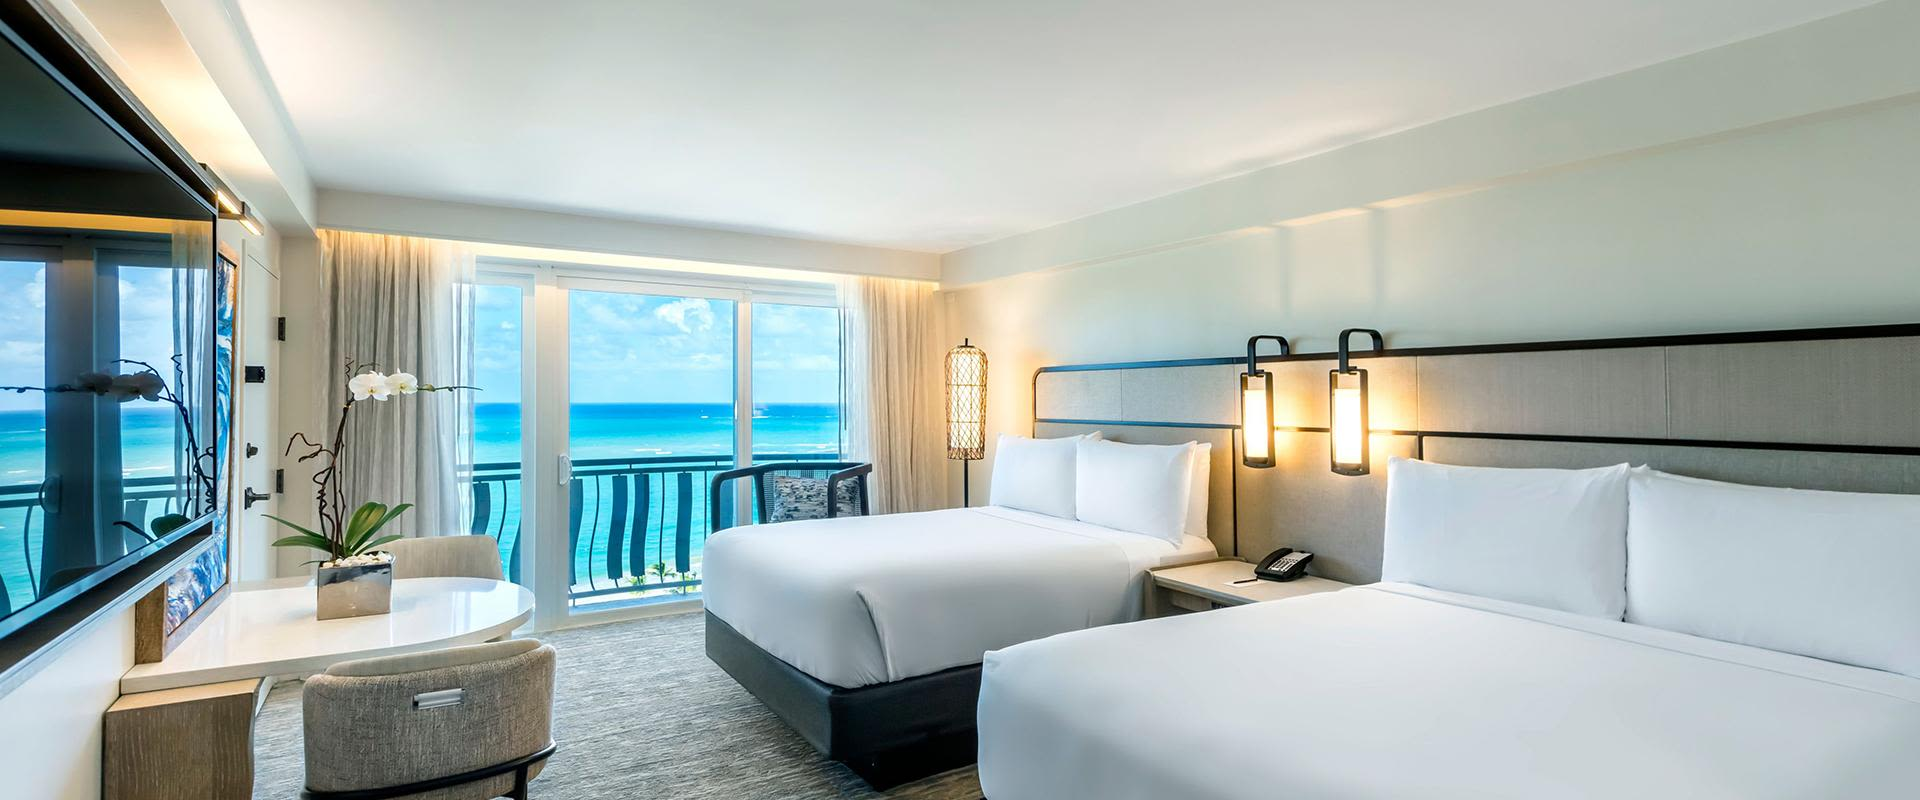 Double Bed Guest Room Oceanview